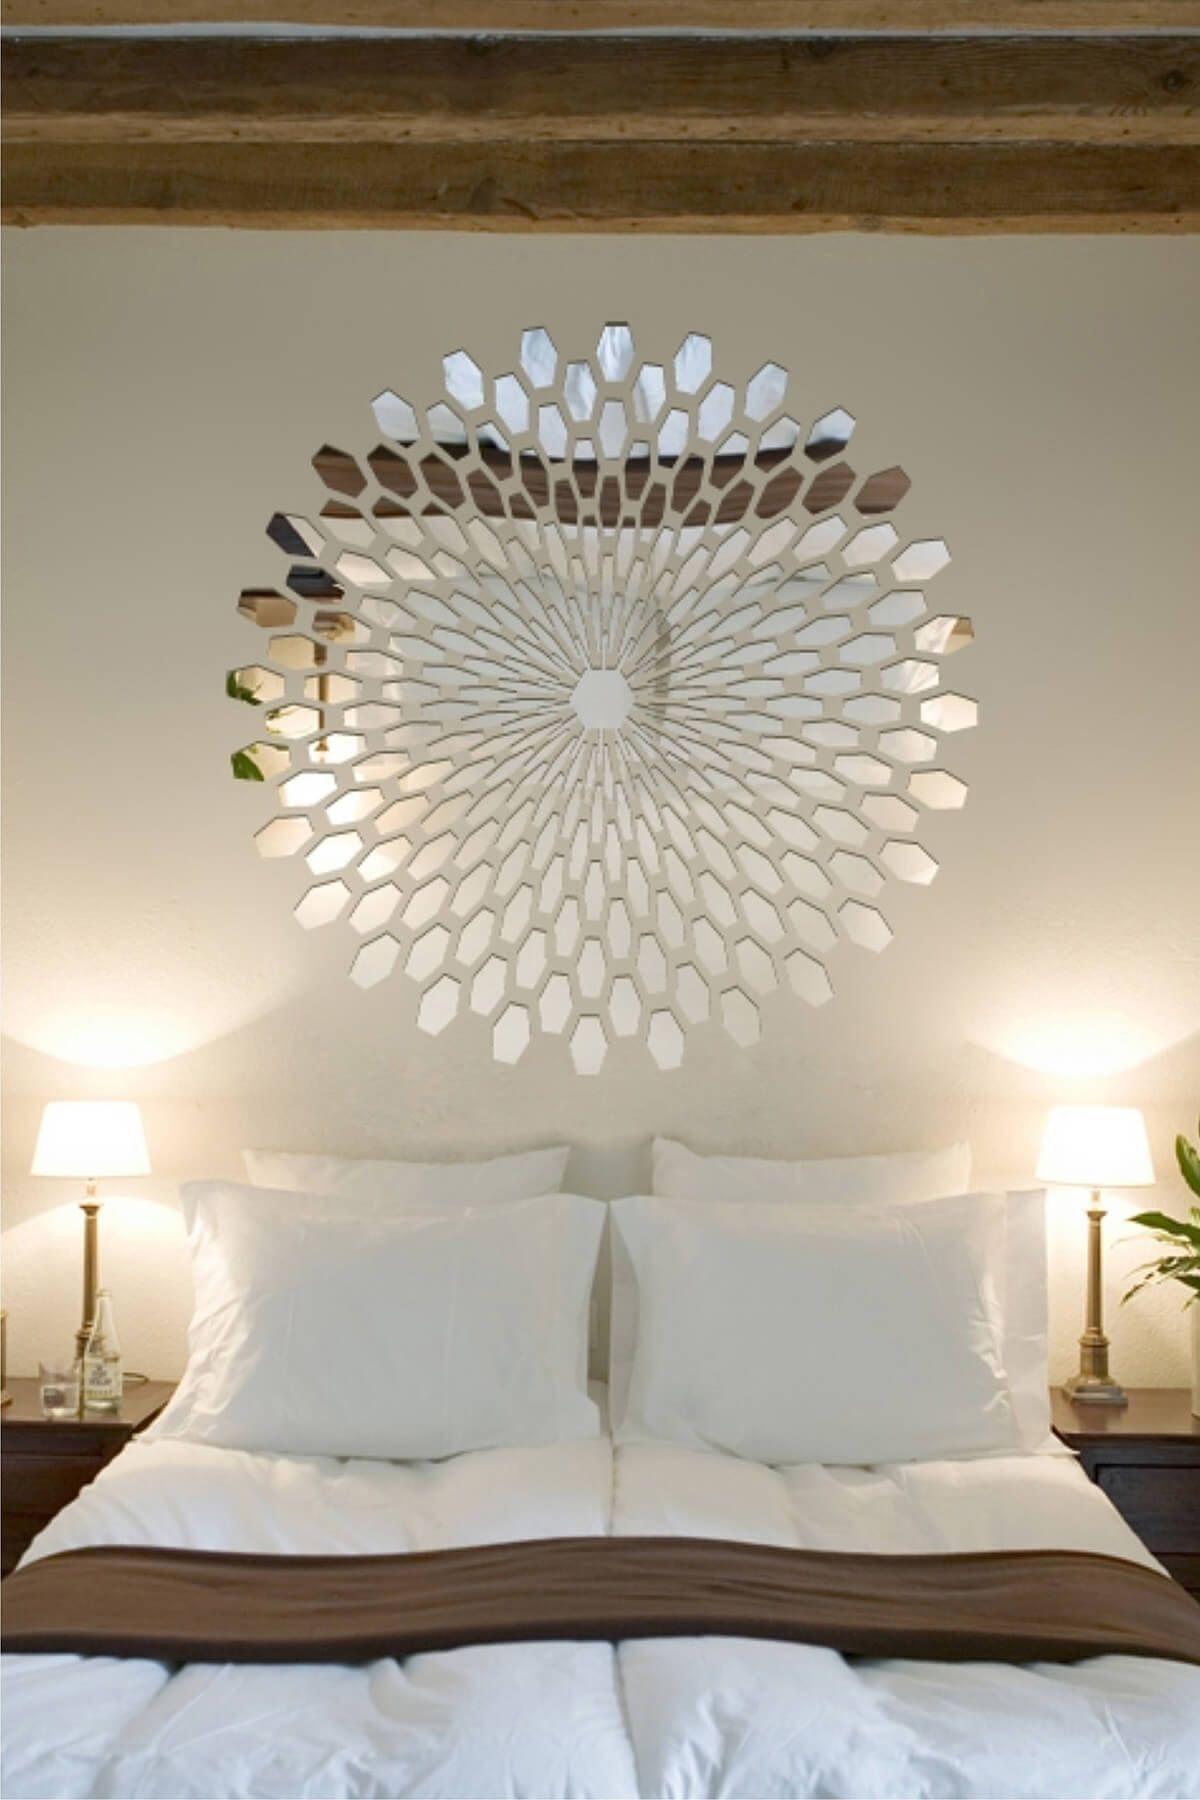 45 Mirror Decoration Ideas To Brighten Your Home Home Decor Decor Home Bedroom Bedroom wall decorating ideas